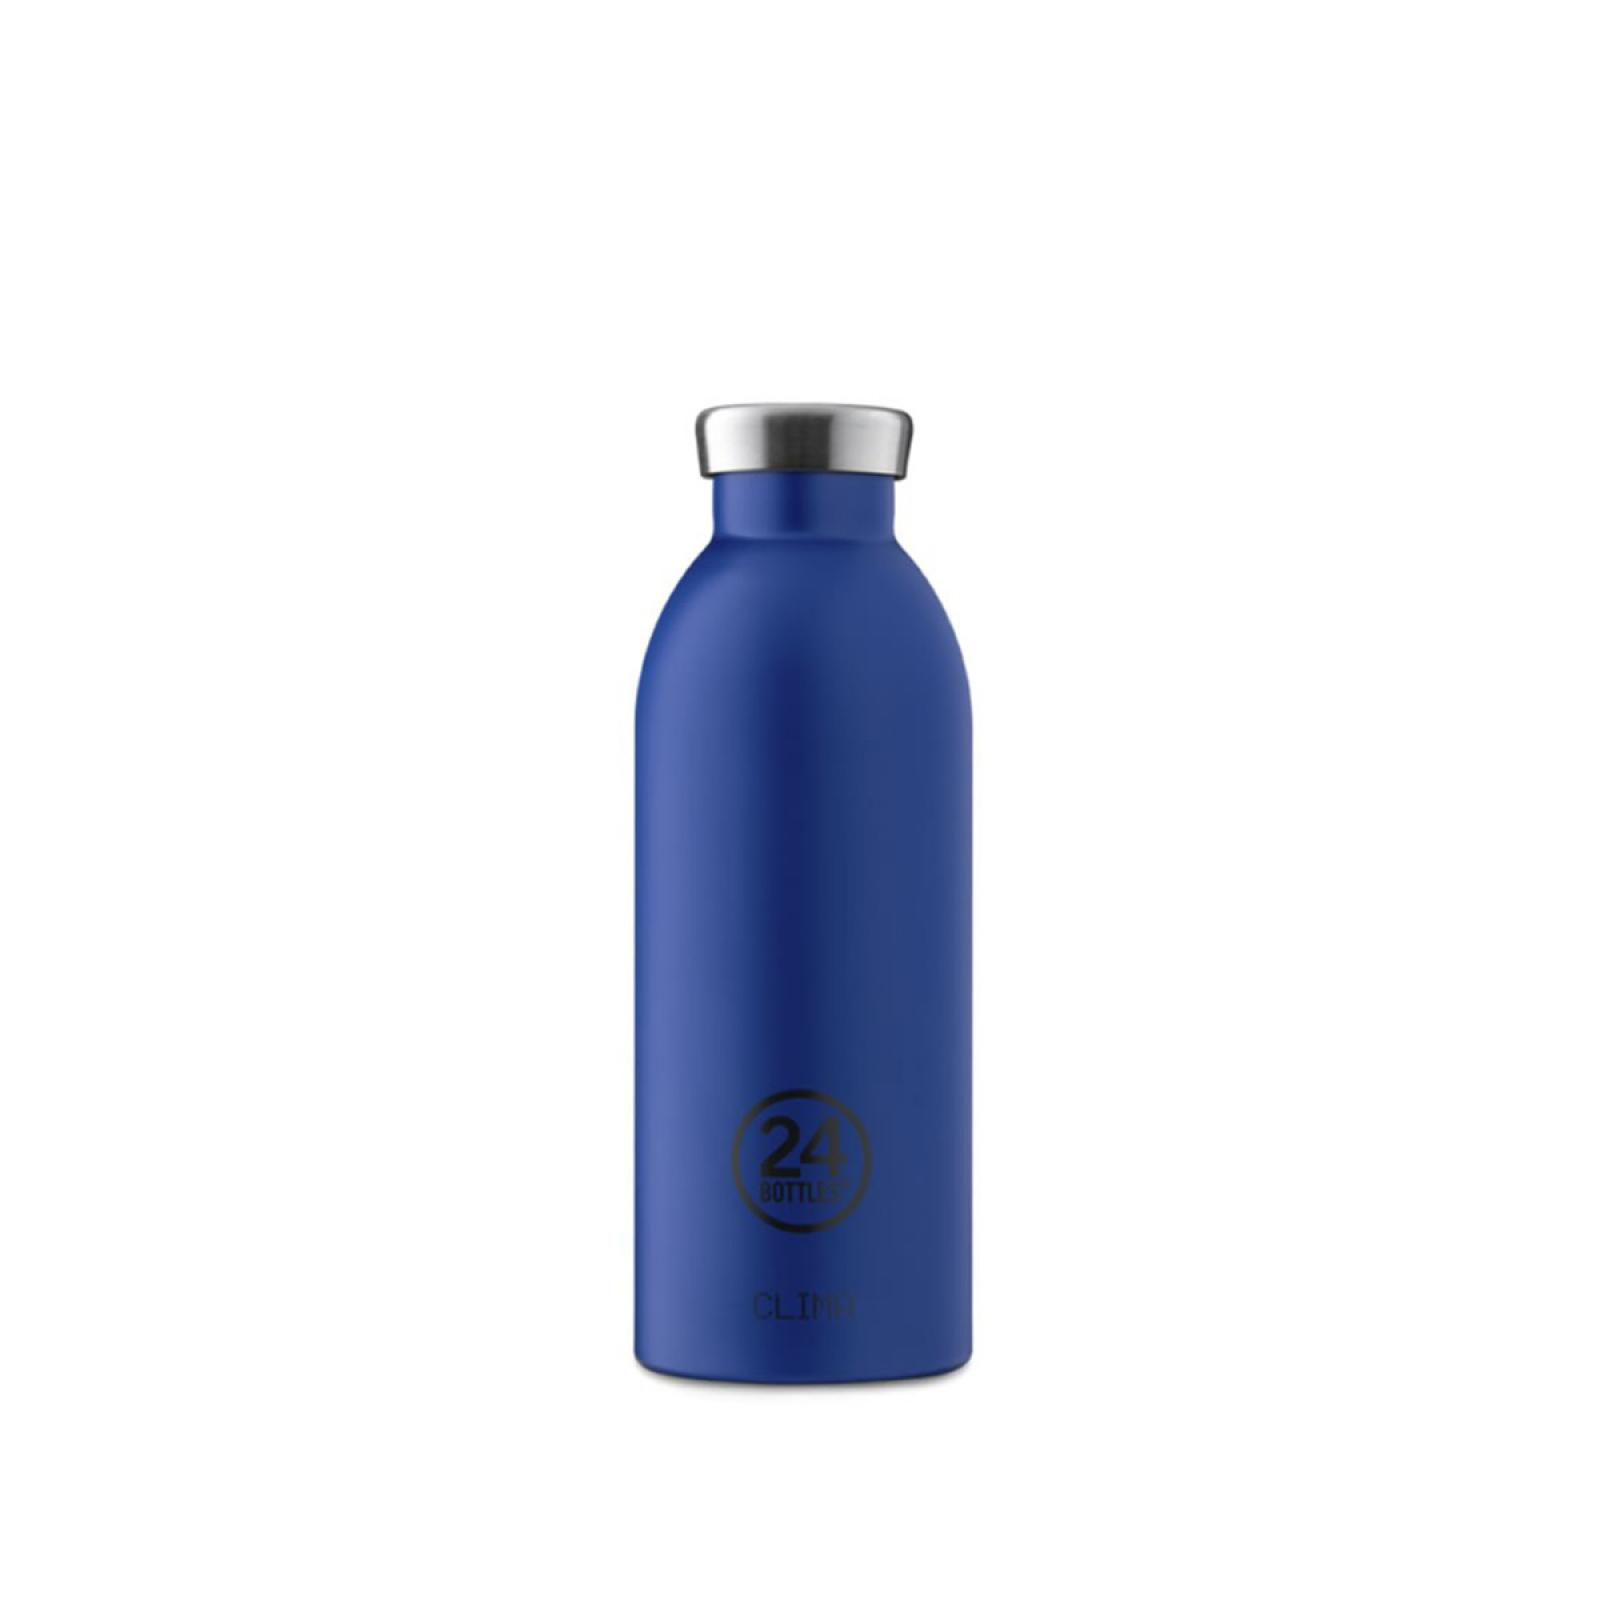 24BO Clima Bottle Chromatic Gold Blue 500 ml - 1